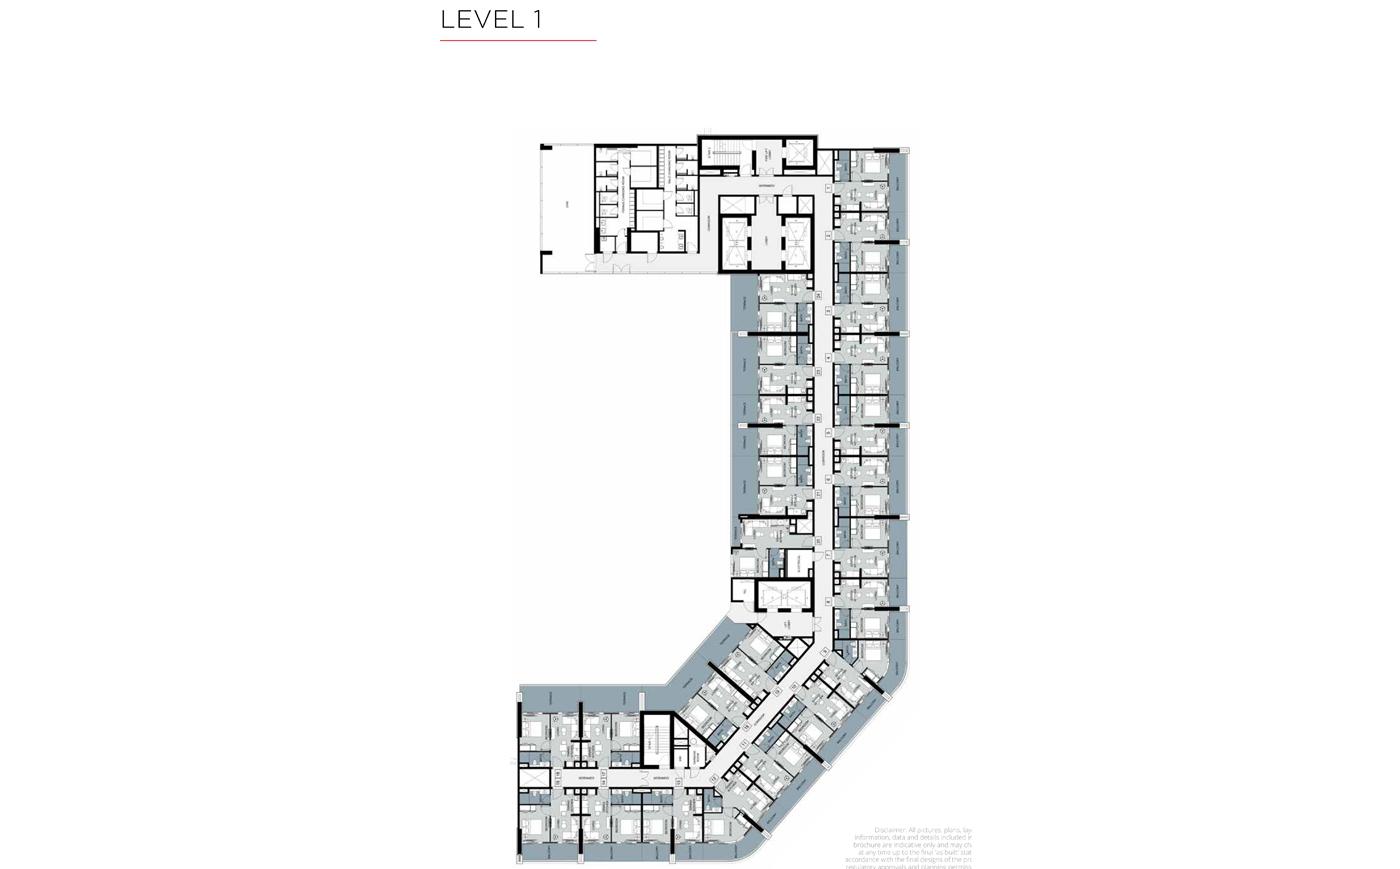 Typical Floor, Level 1